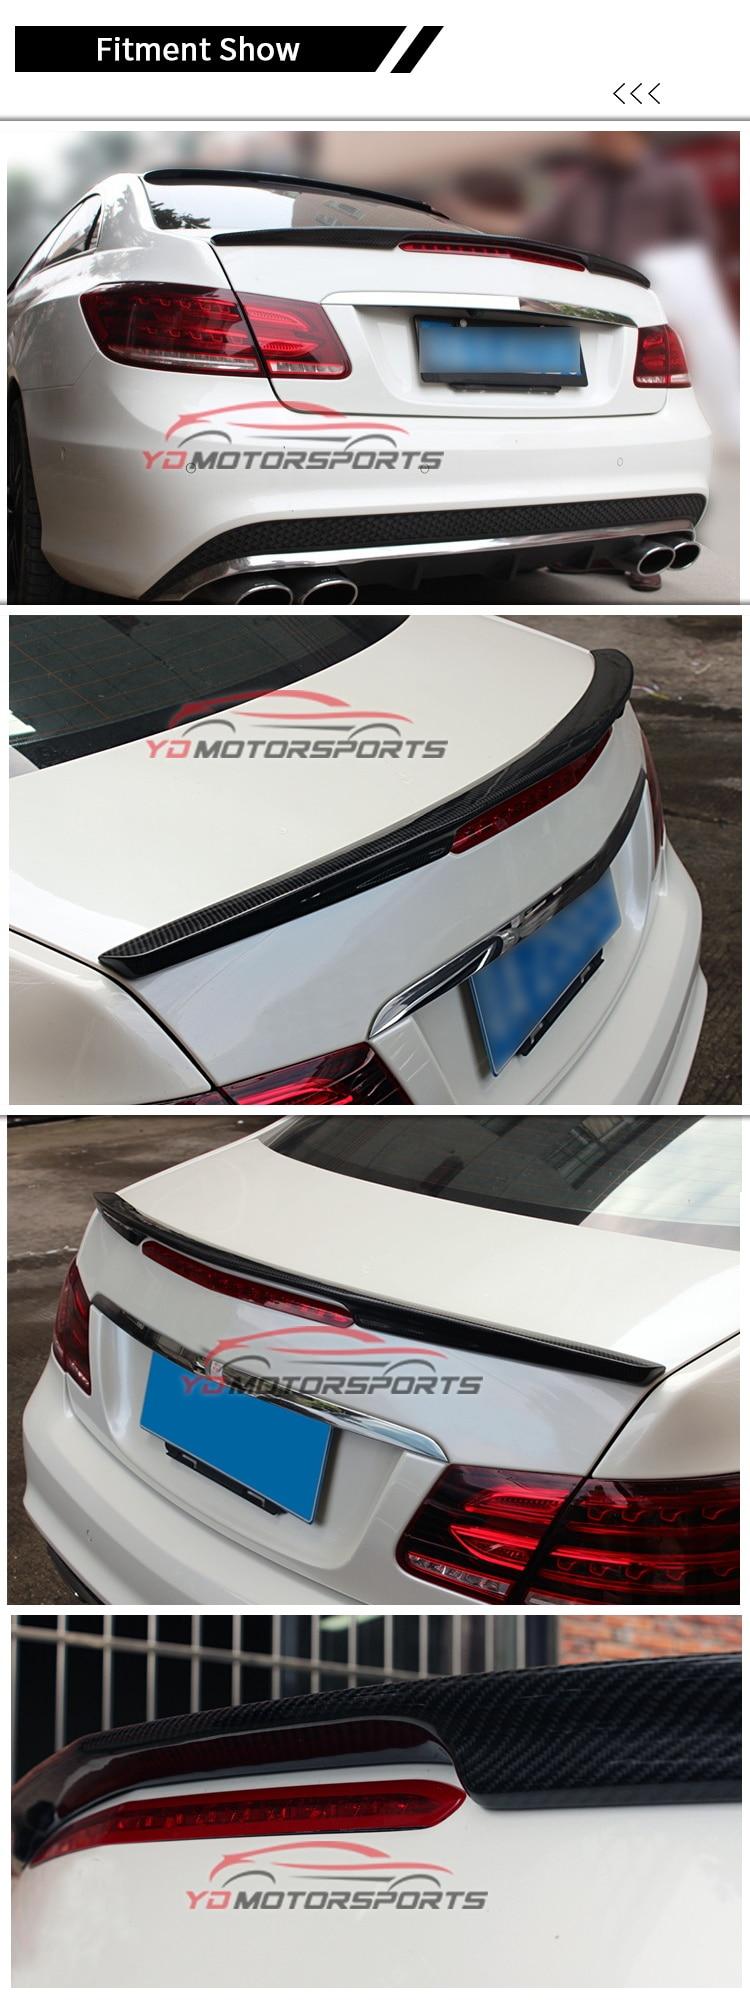 10-13 A Style Rear Trunk Spoiler ABS Painted Matte Black Fits Benz C207 E Class